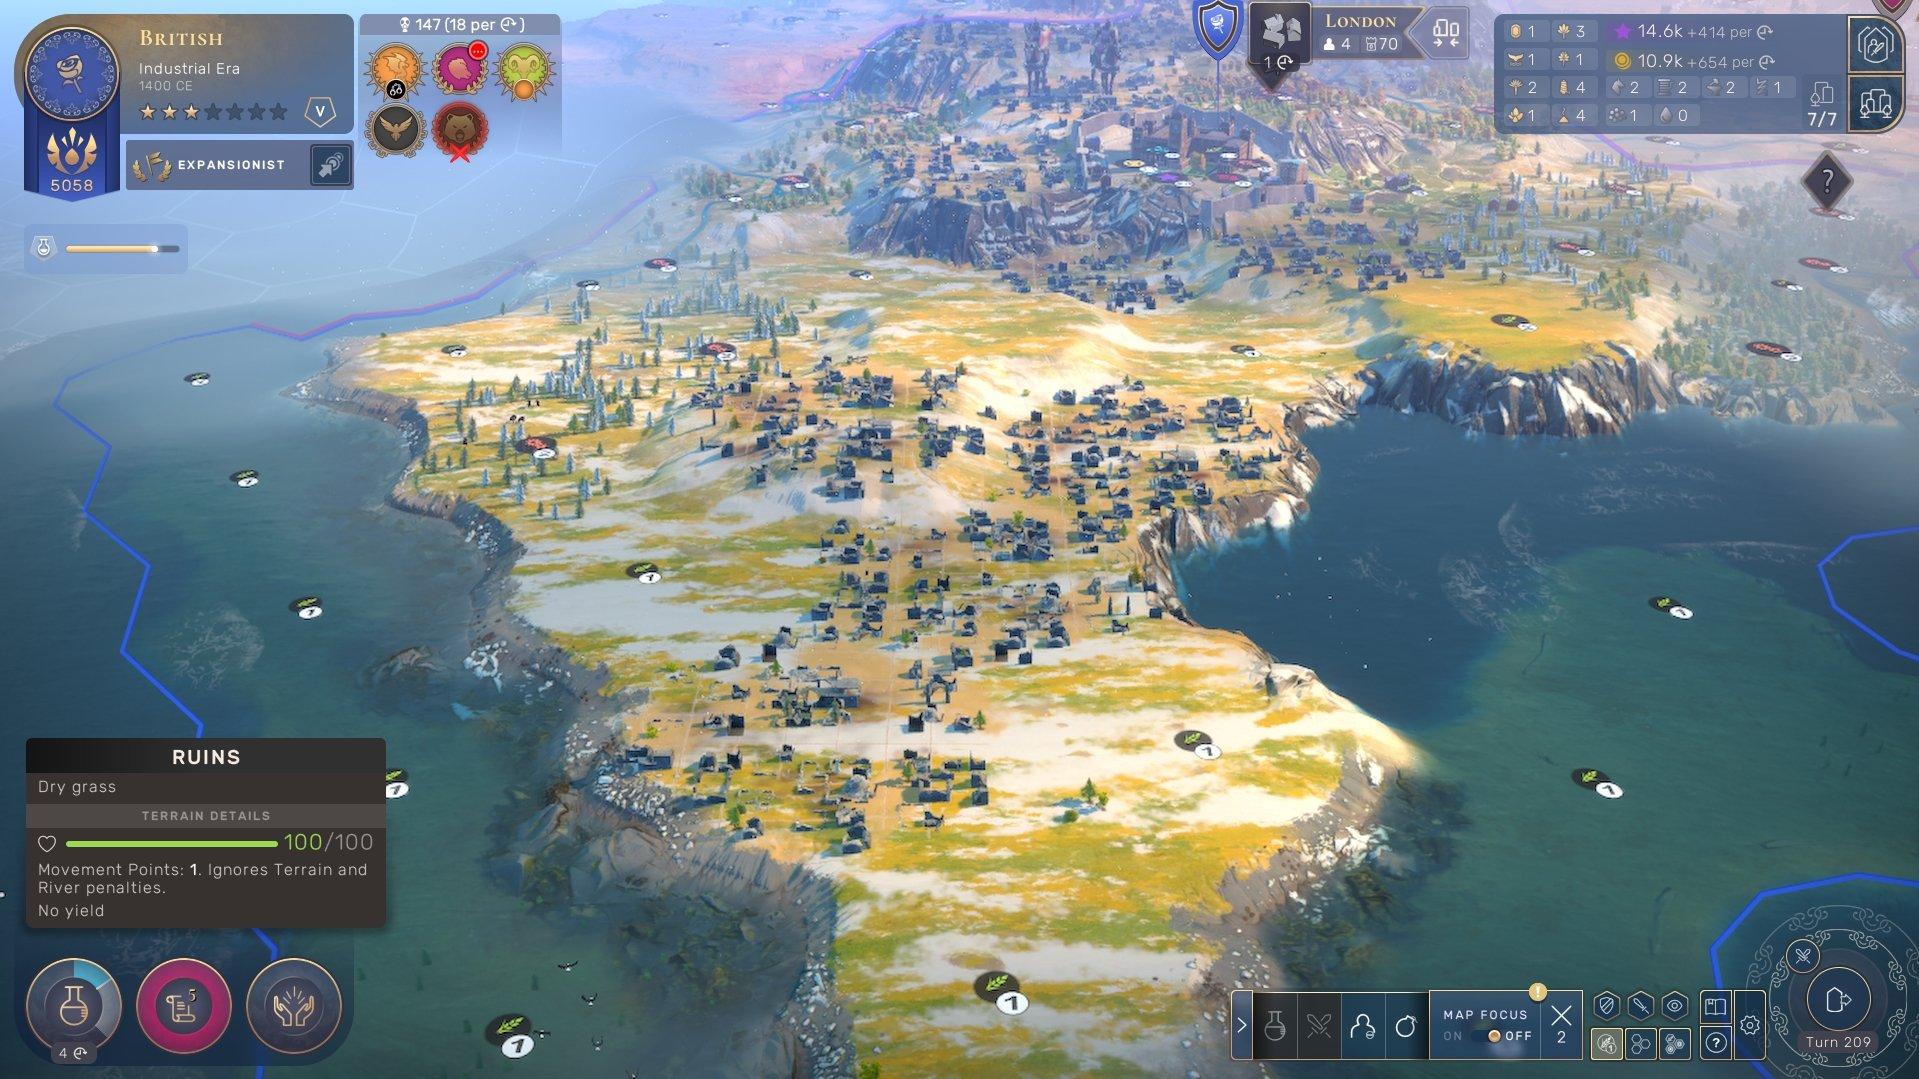 Humankind - Ruins Tiles Screenshot